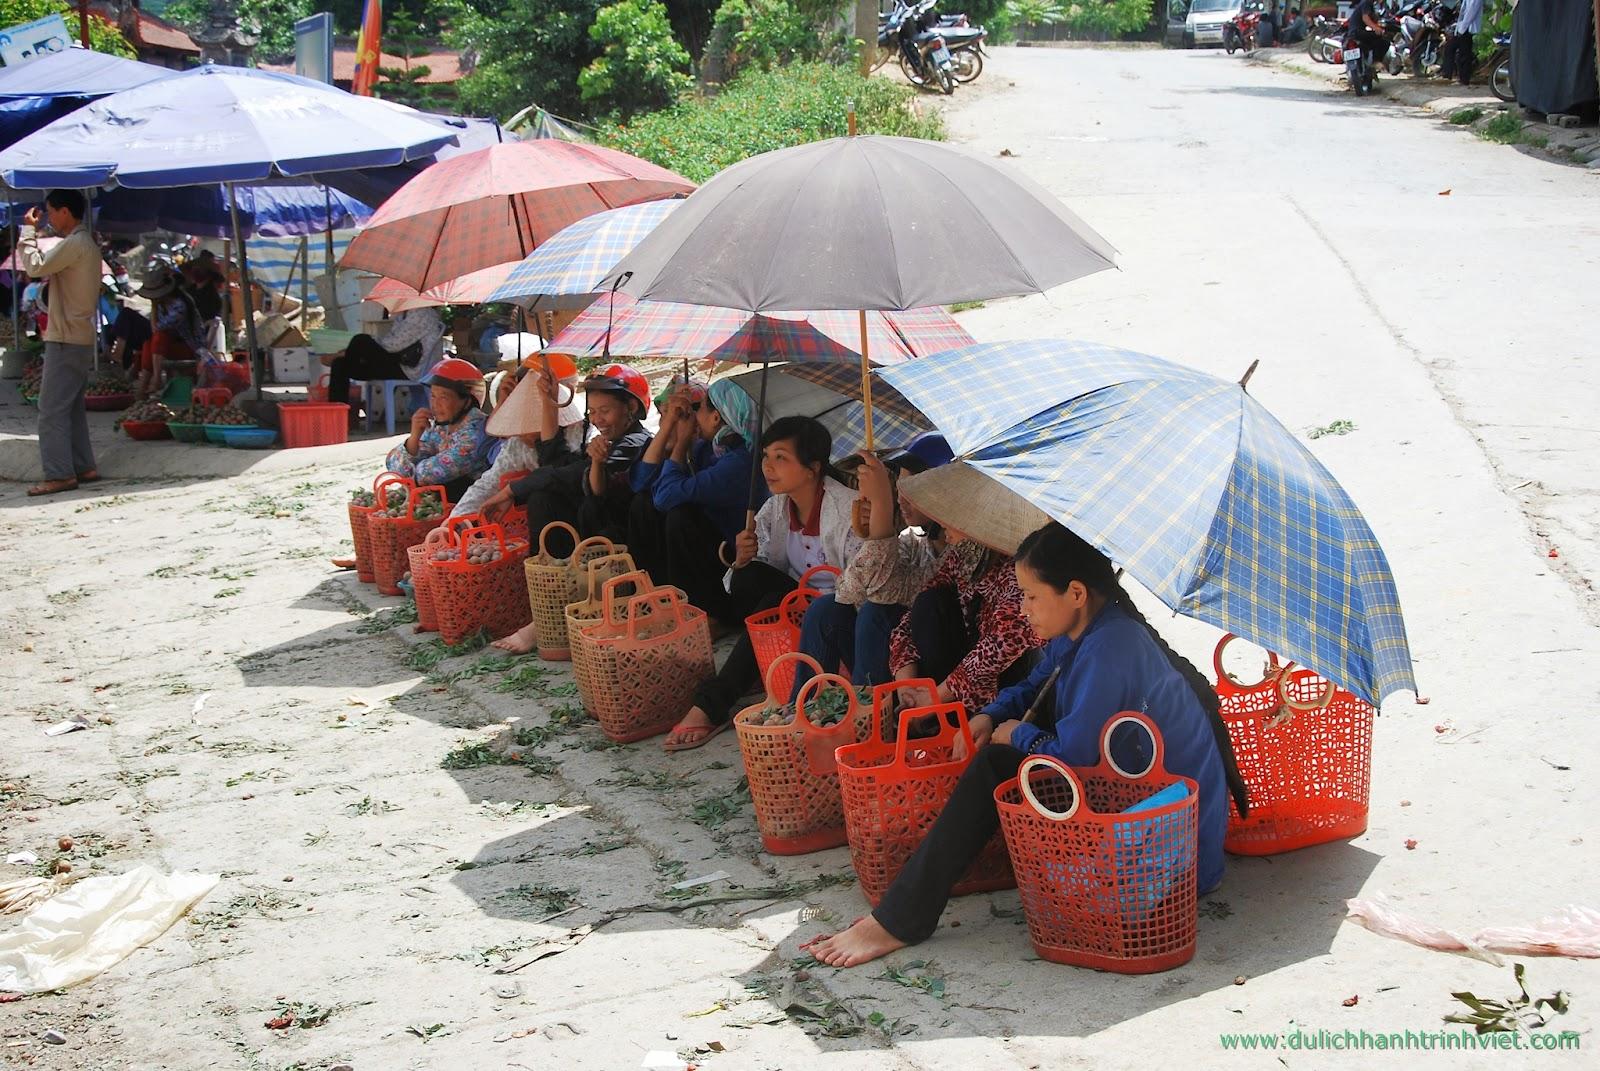 Balade au marché hebdomadaire Bac Ha - province de Lao Cai